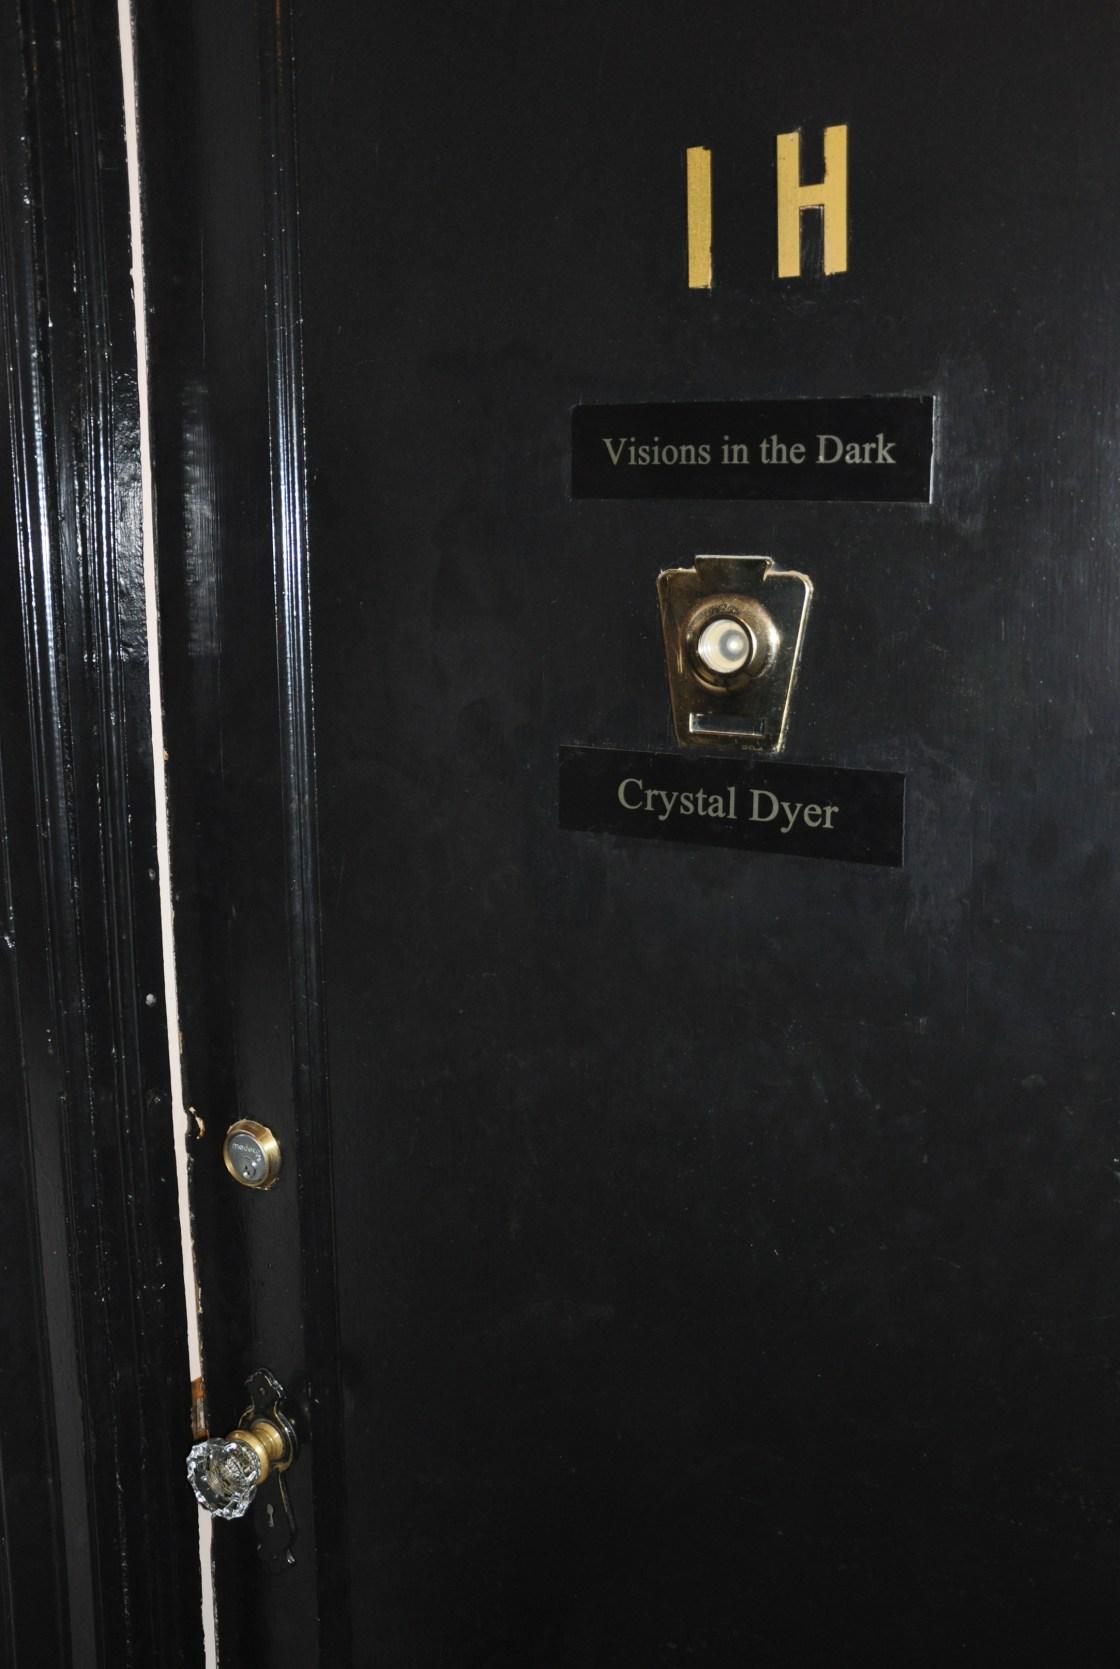 Crystal Dyer Visions in the Dark Door IH New York NYC